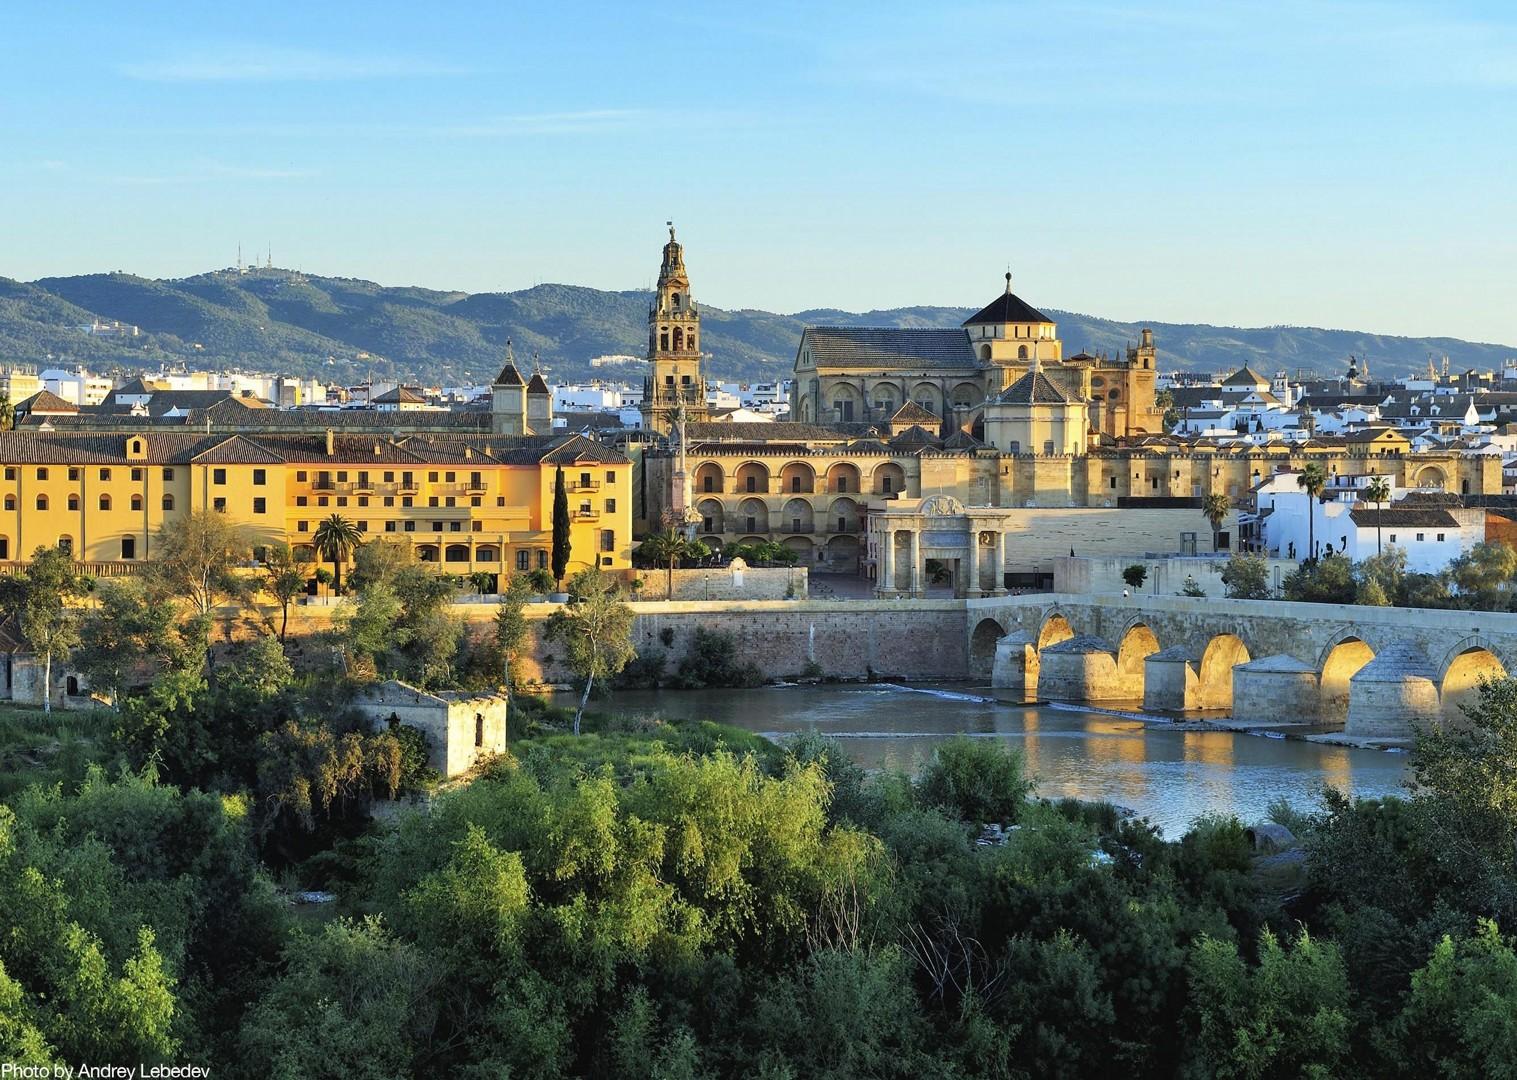 cordoba-cycling-holiday-in-spain-granada-to-seville-leisure-cycling.jpg - Southern Spain - Granada to Seville - Self-Guided Leisure Cycling Holiday - Leisure Cycling